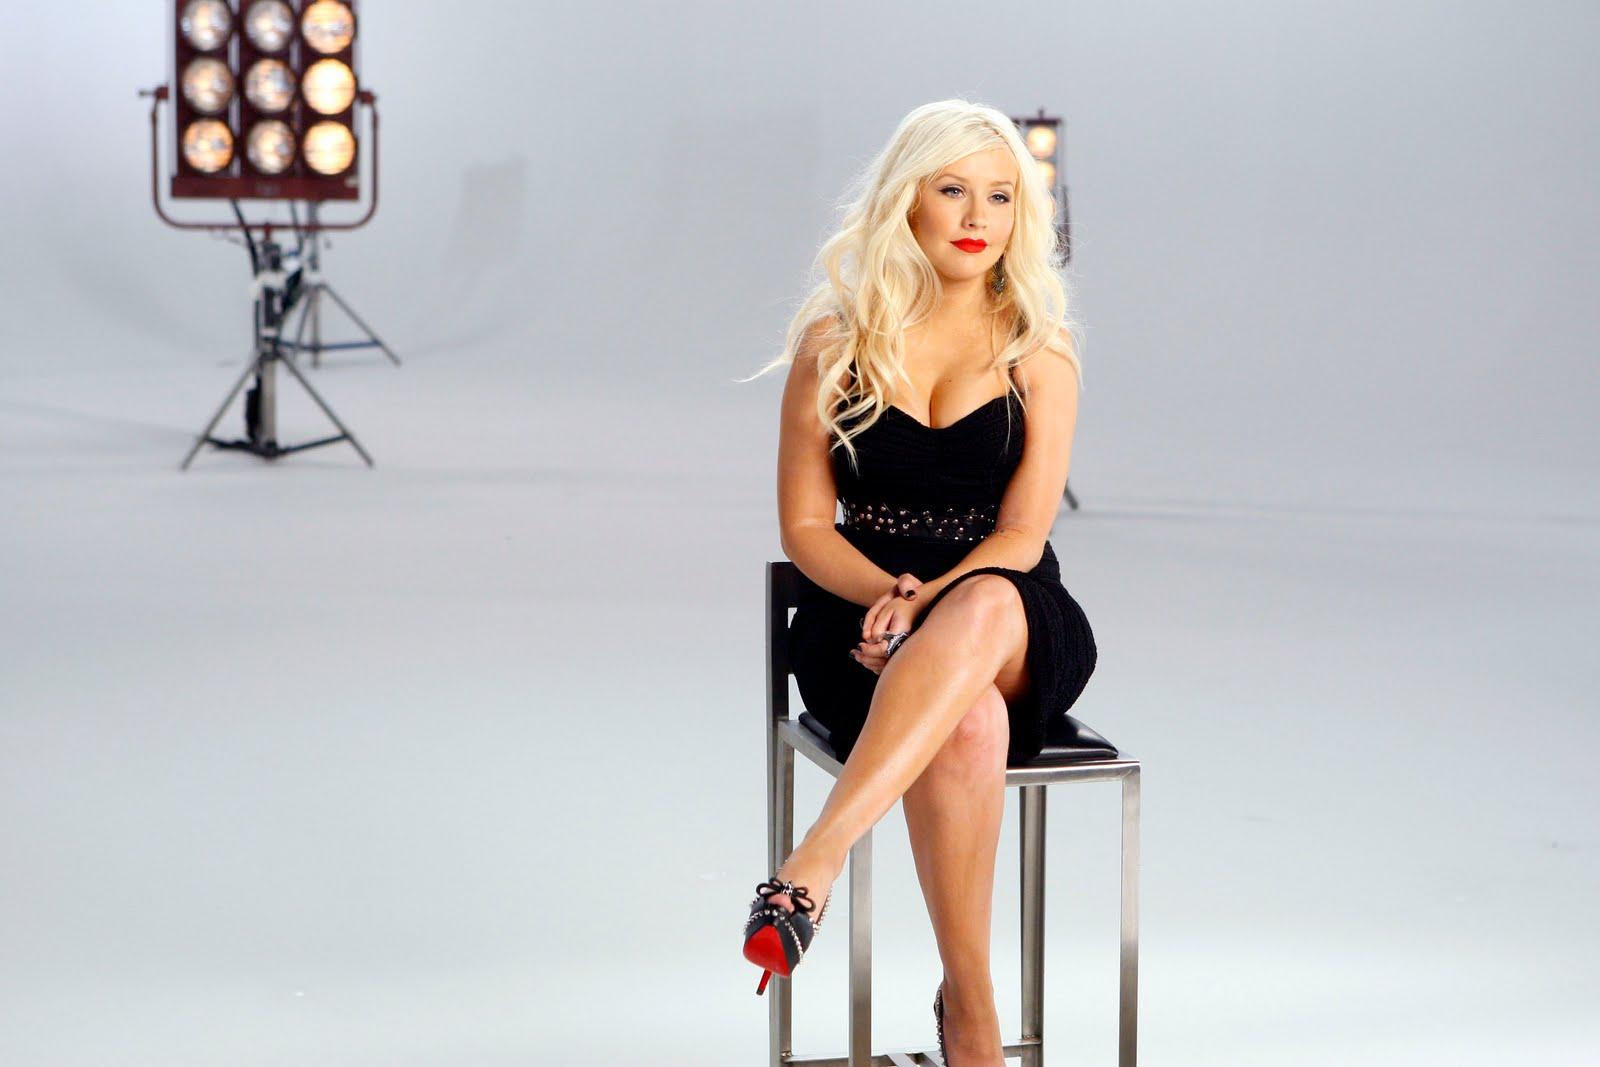 http://2.bp.blogspot.com/-FpWBddfAgkg/TYuecW3vHQI/AAAAAAAAG7Y/yRV6KlJBiIo/s1600/Christina-Aguilera-The-Voice-03.jpg